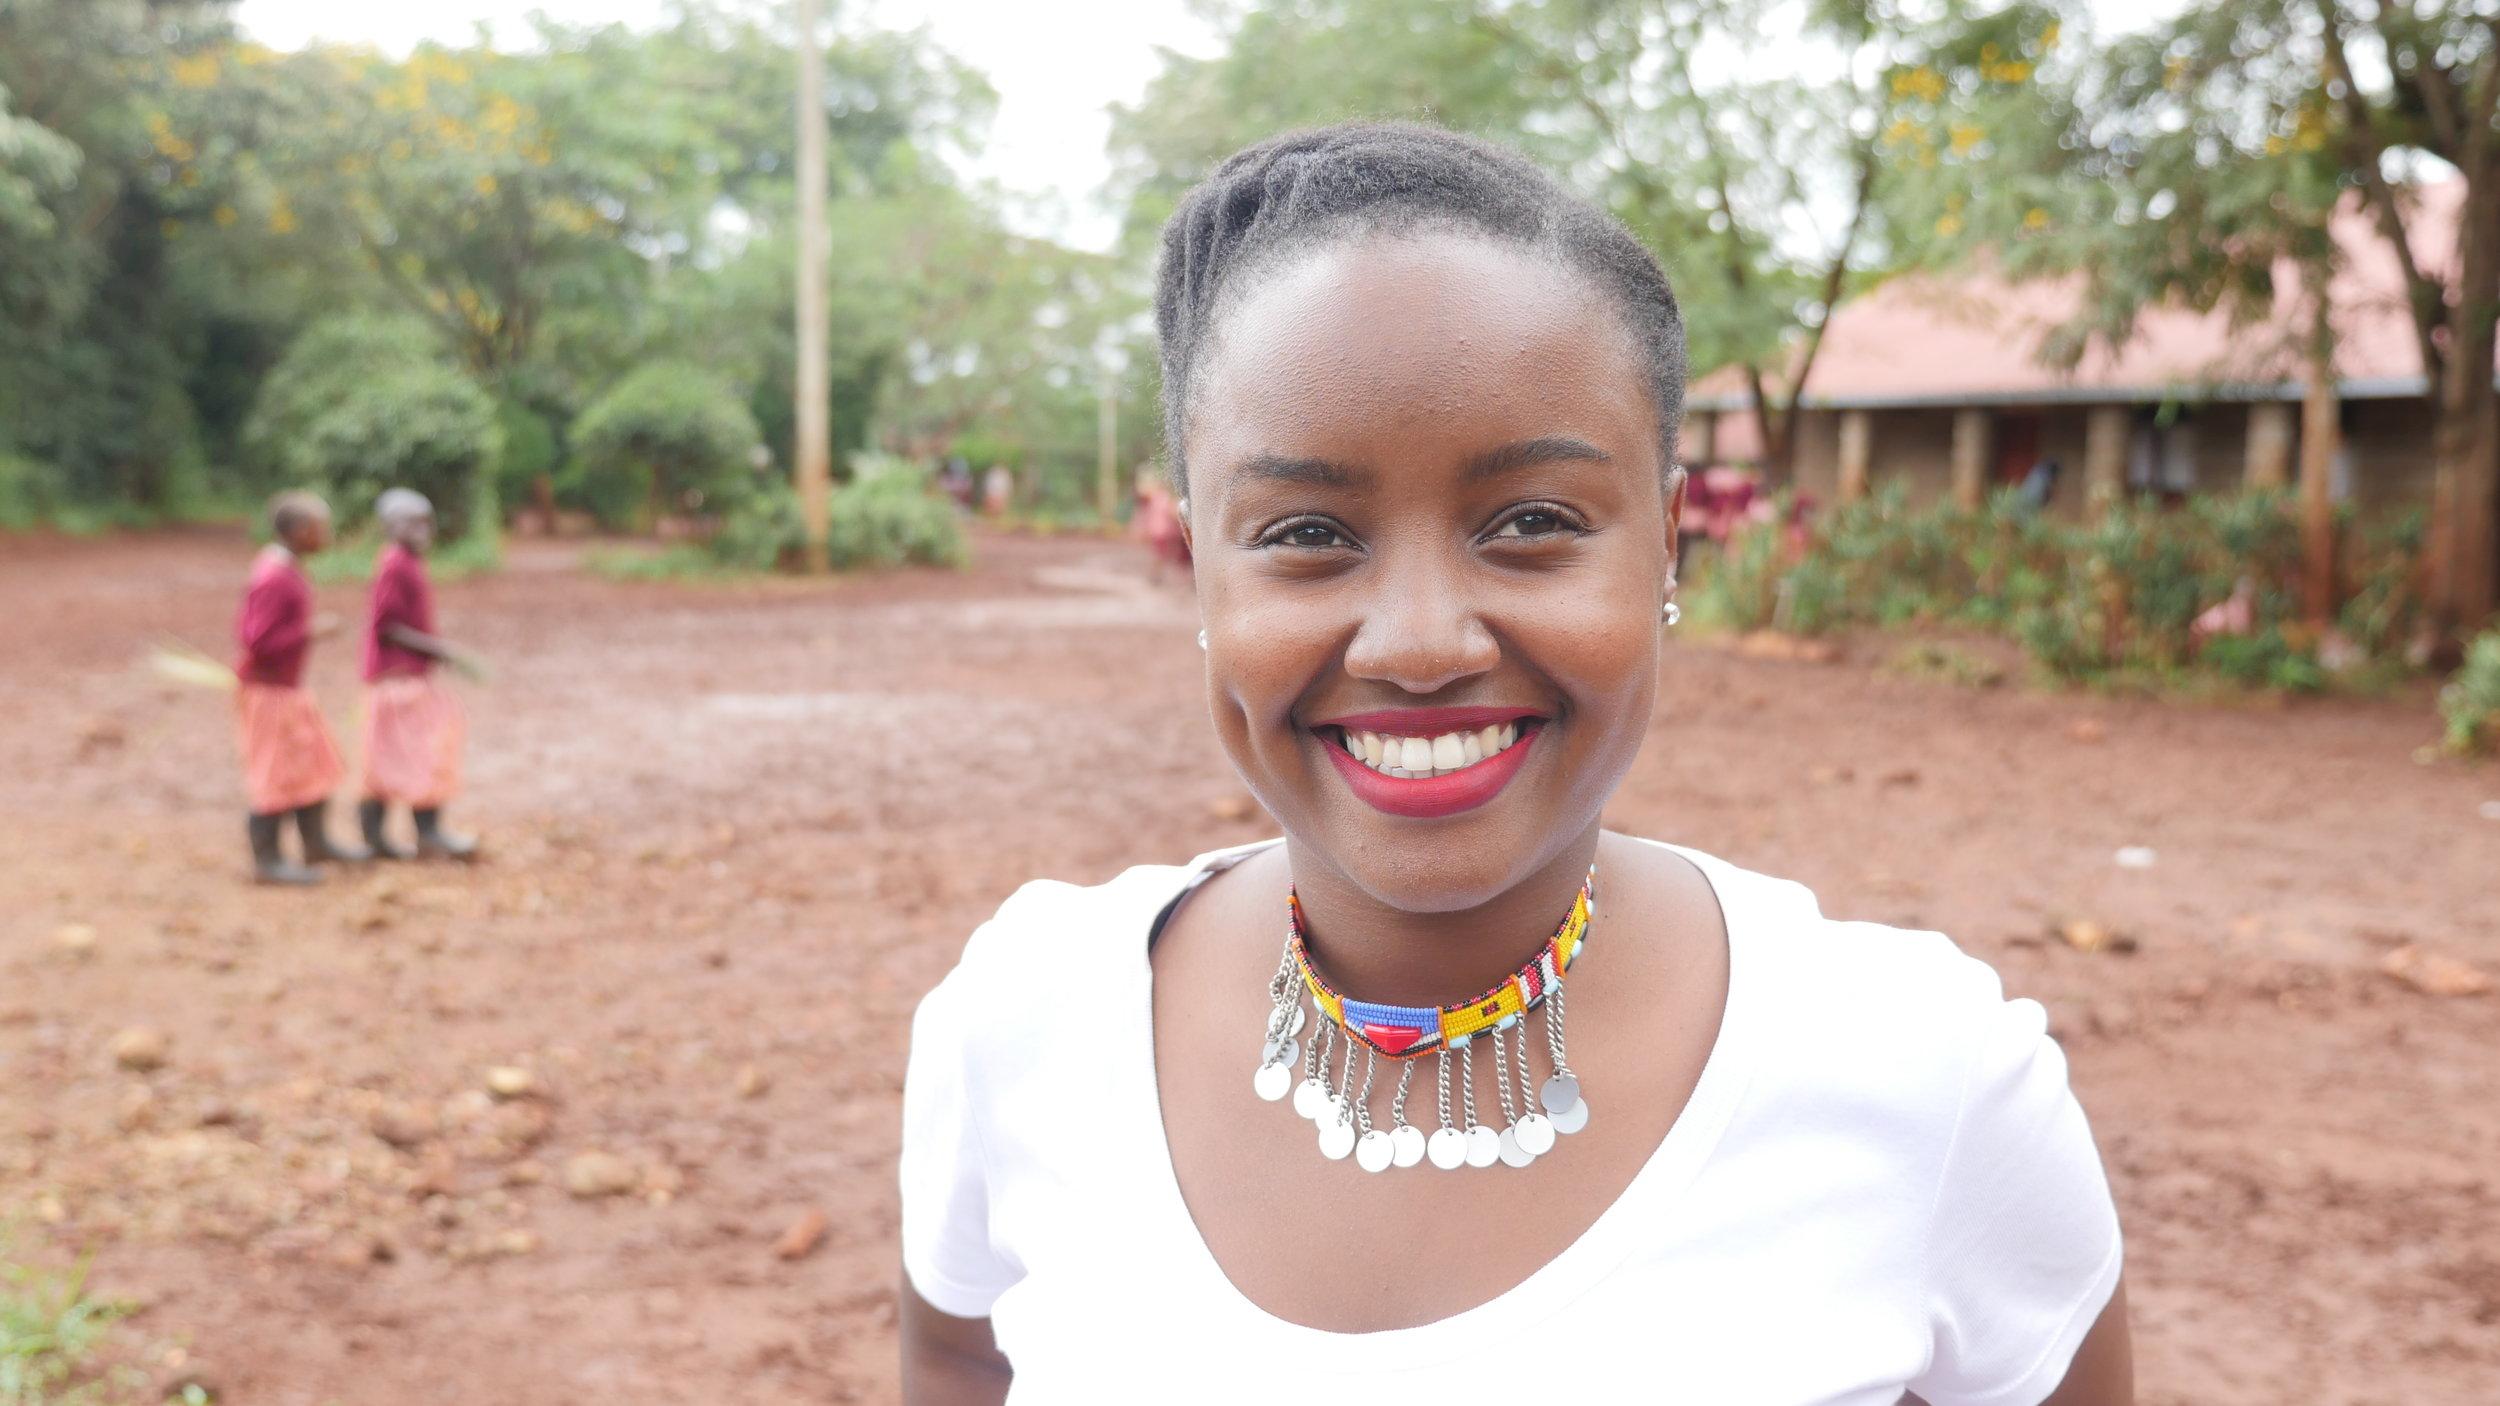 Founder, Food 4 Education, Wawira Njiru   Photo credit: Food 4 Education